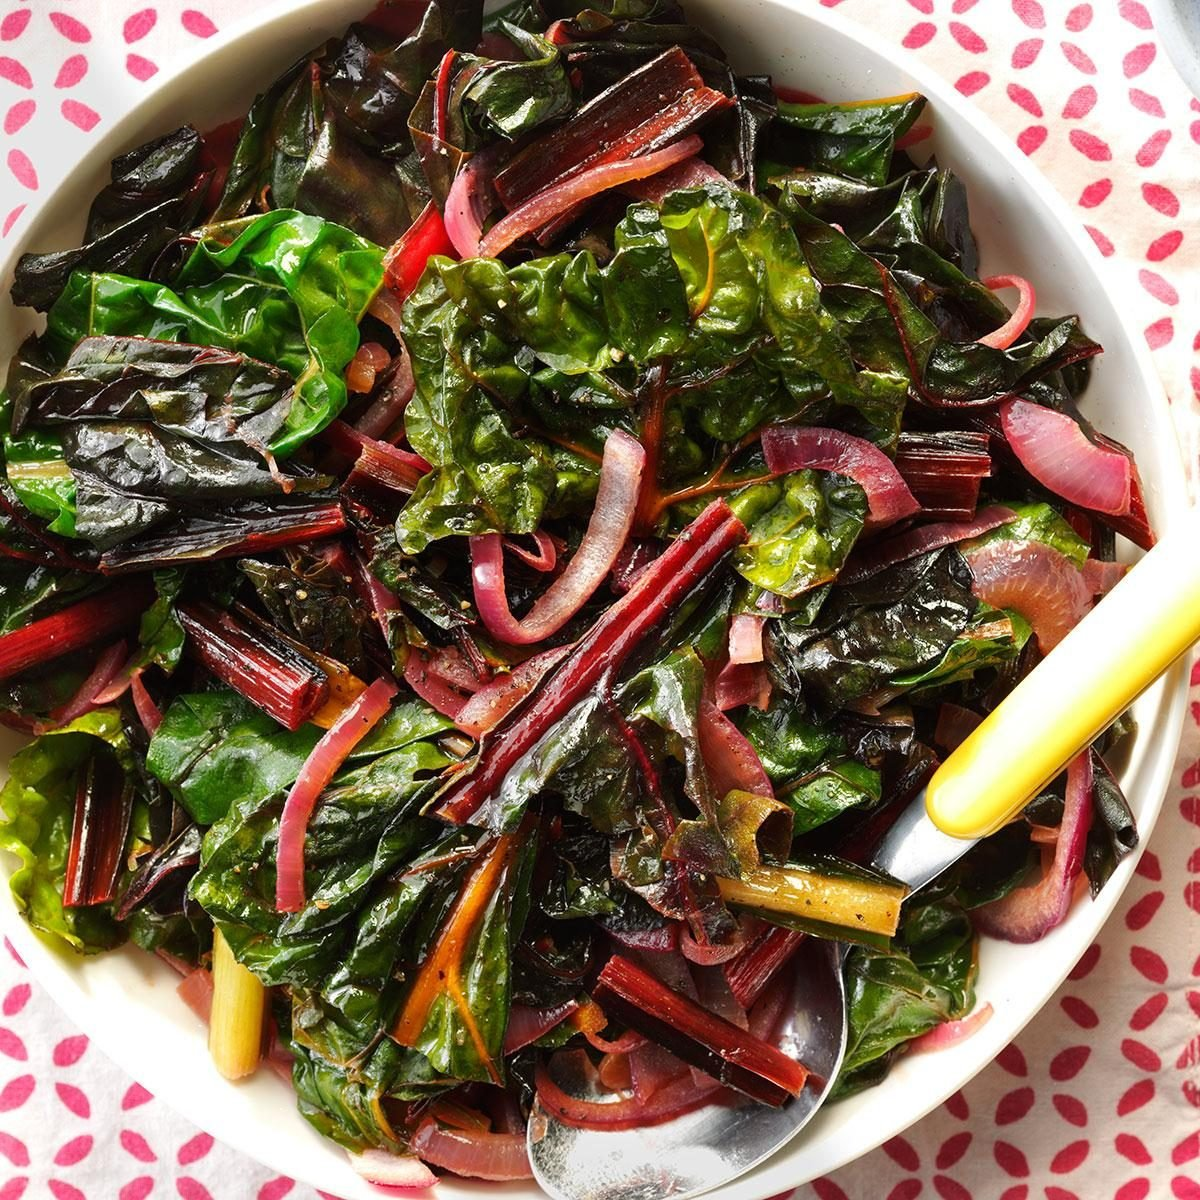 Garden-Fresh Rainbow Chard Recipe | Taste of Home